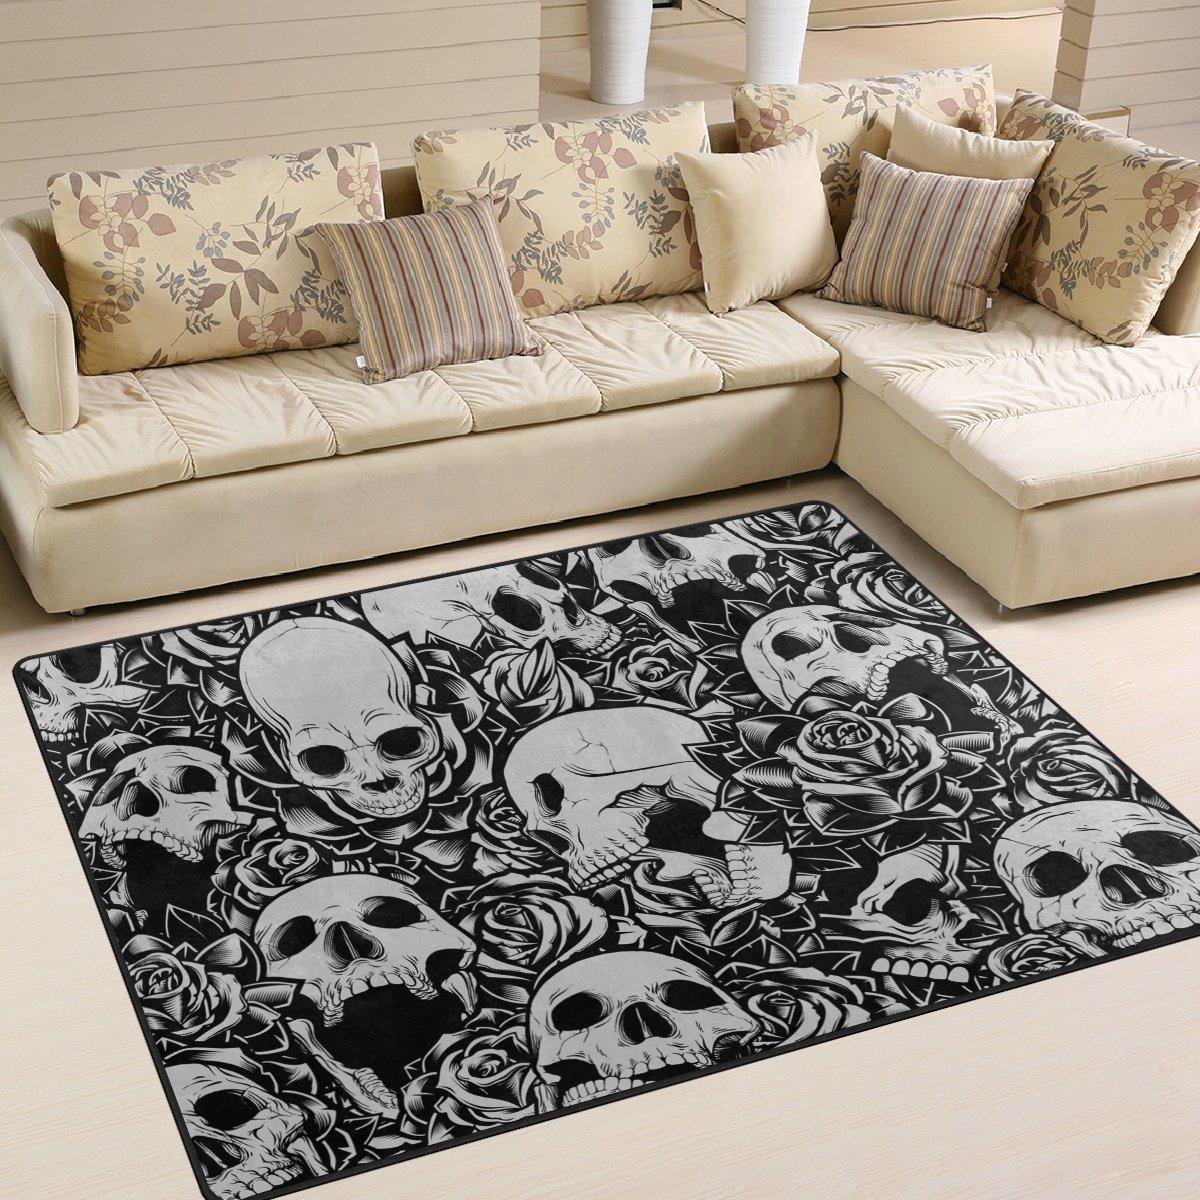 YZGO Day of The Dead Horror Skull Kids Area Rug, Non-Slip Floor Mat Soft Resting Area Doormats for Living Dining Bedroom 5' x 7'